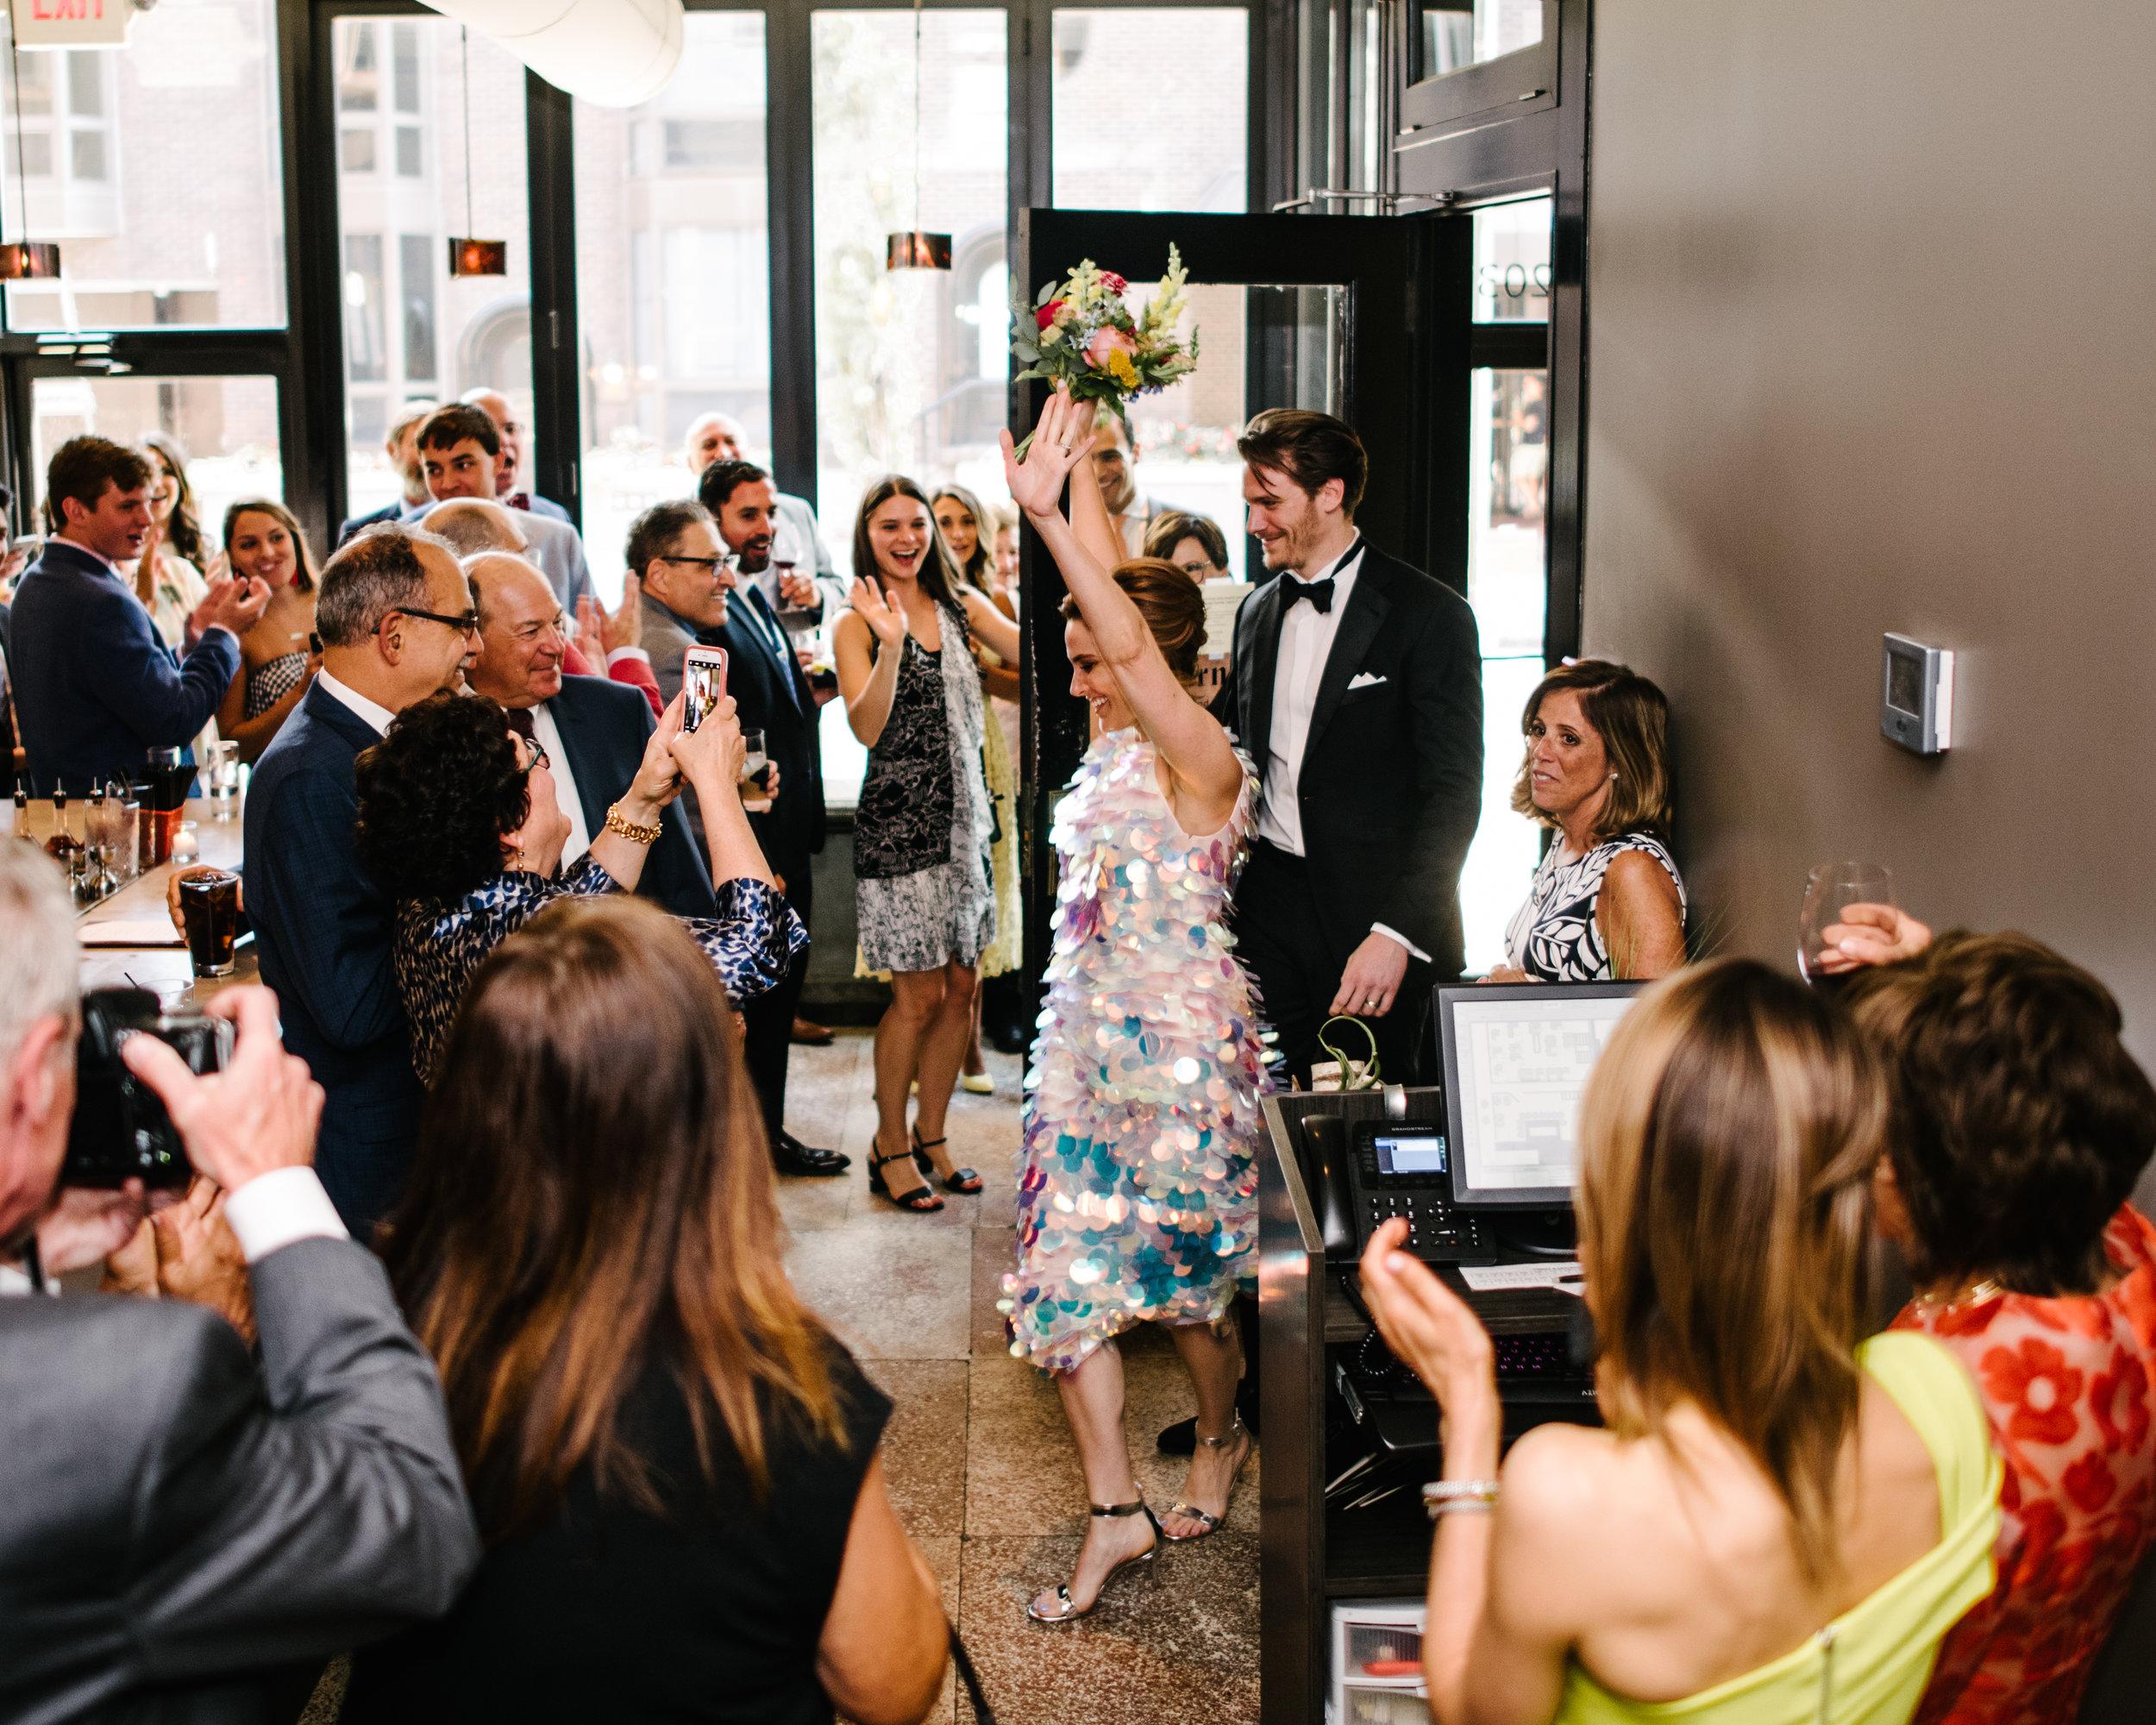 agpcollective_wedding_vernick-3653.jpg